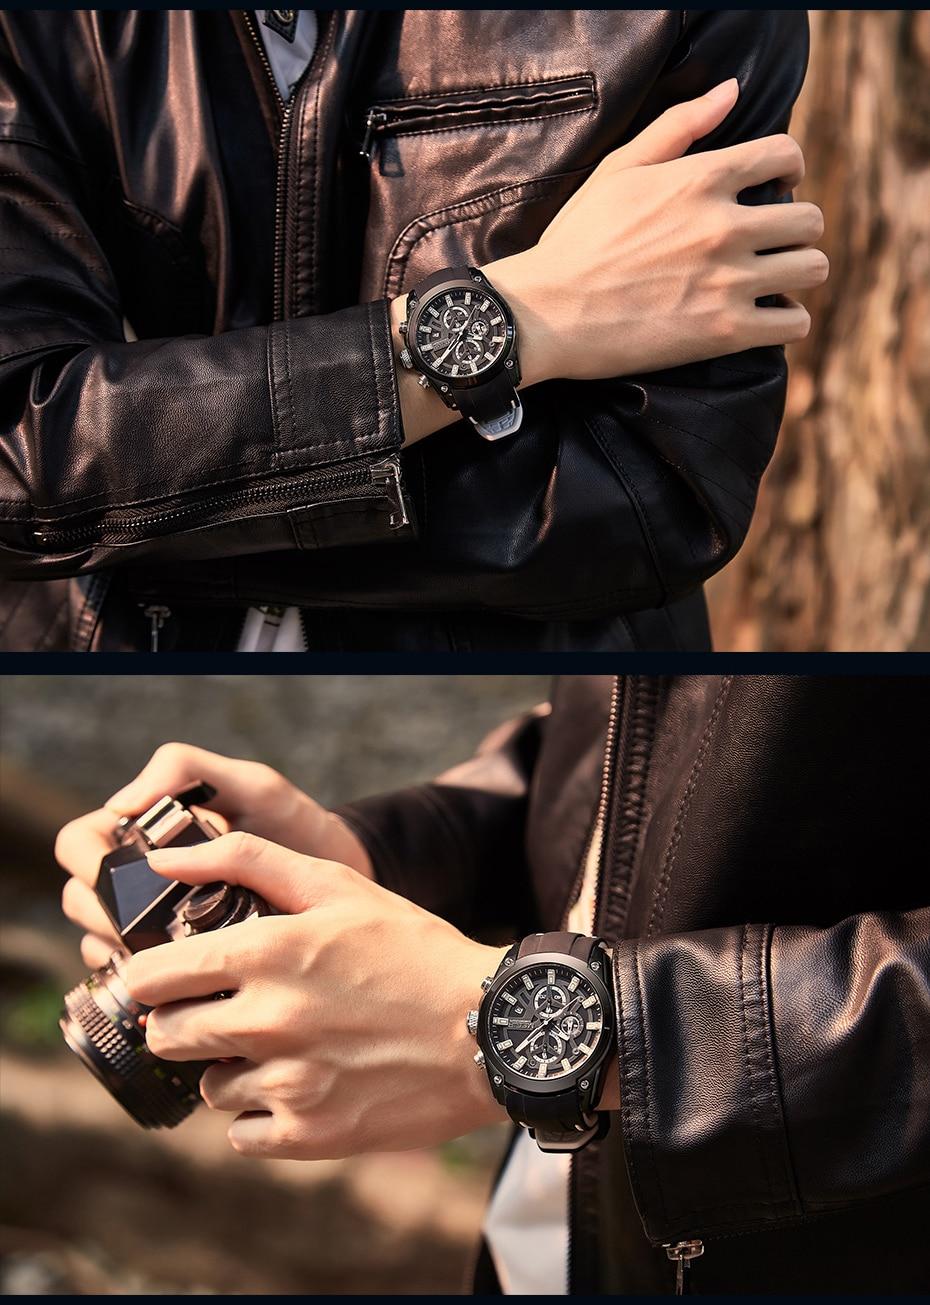 H8b09c21c98c8412385e0433f21f1a478E MEGIR 2020 Blue Sport Watches for Men